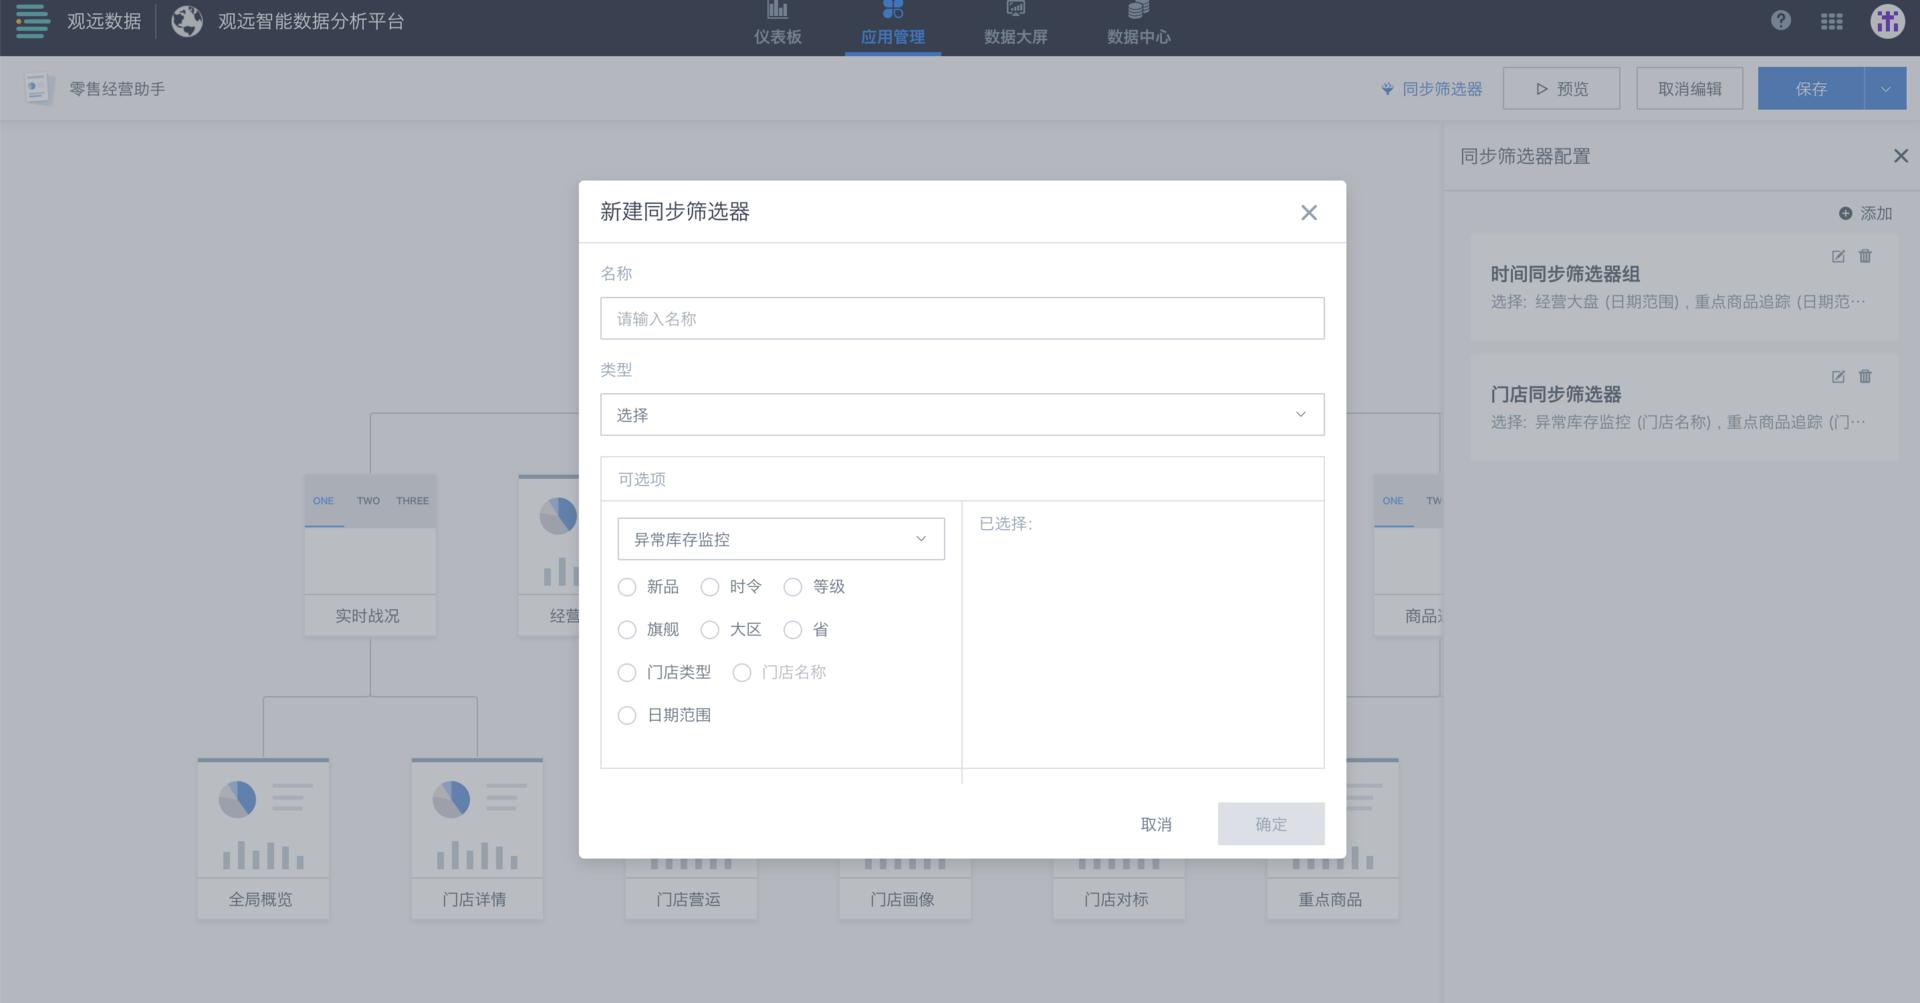 lite-app-10.png